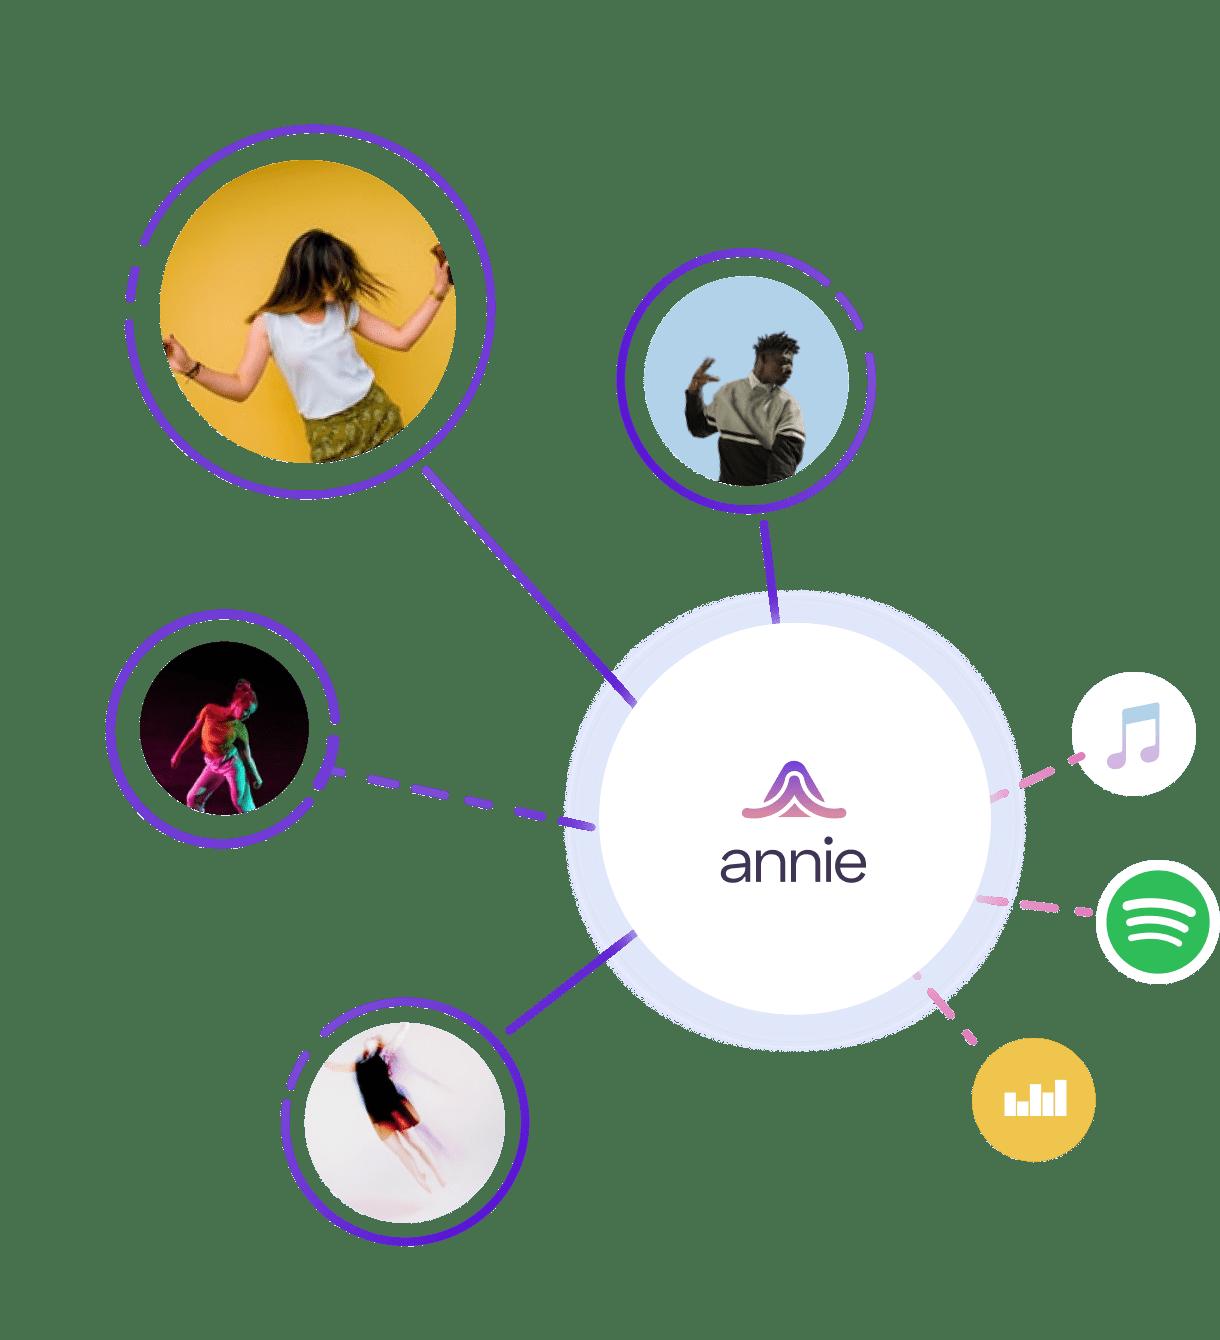 image showing links between platforms